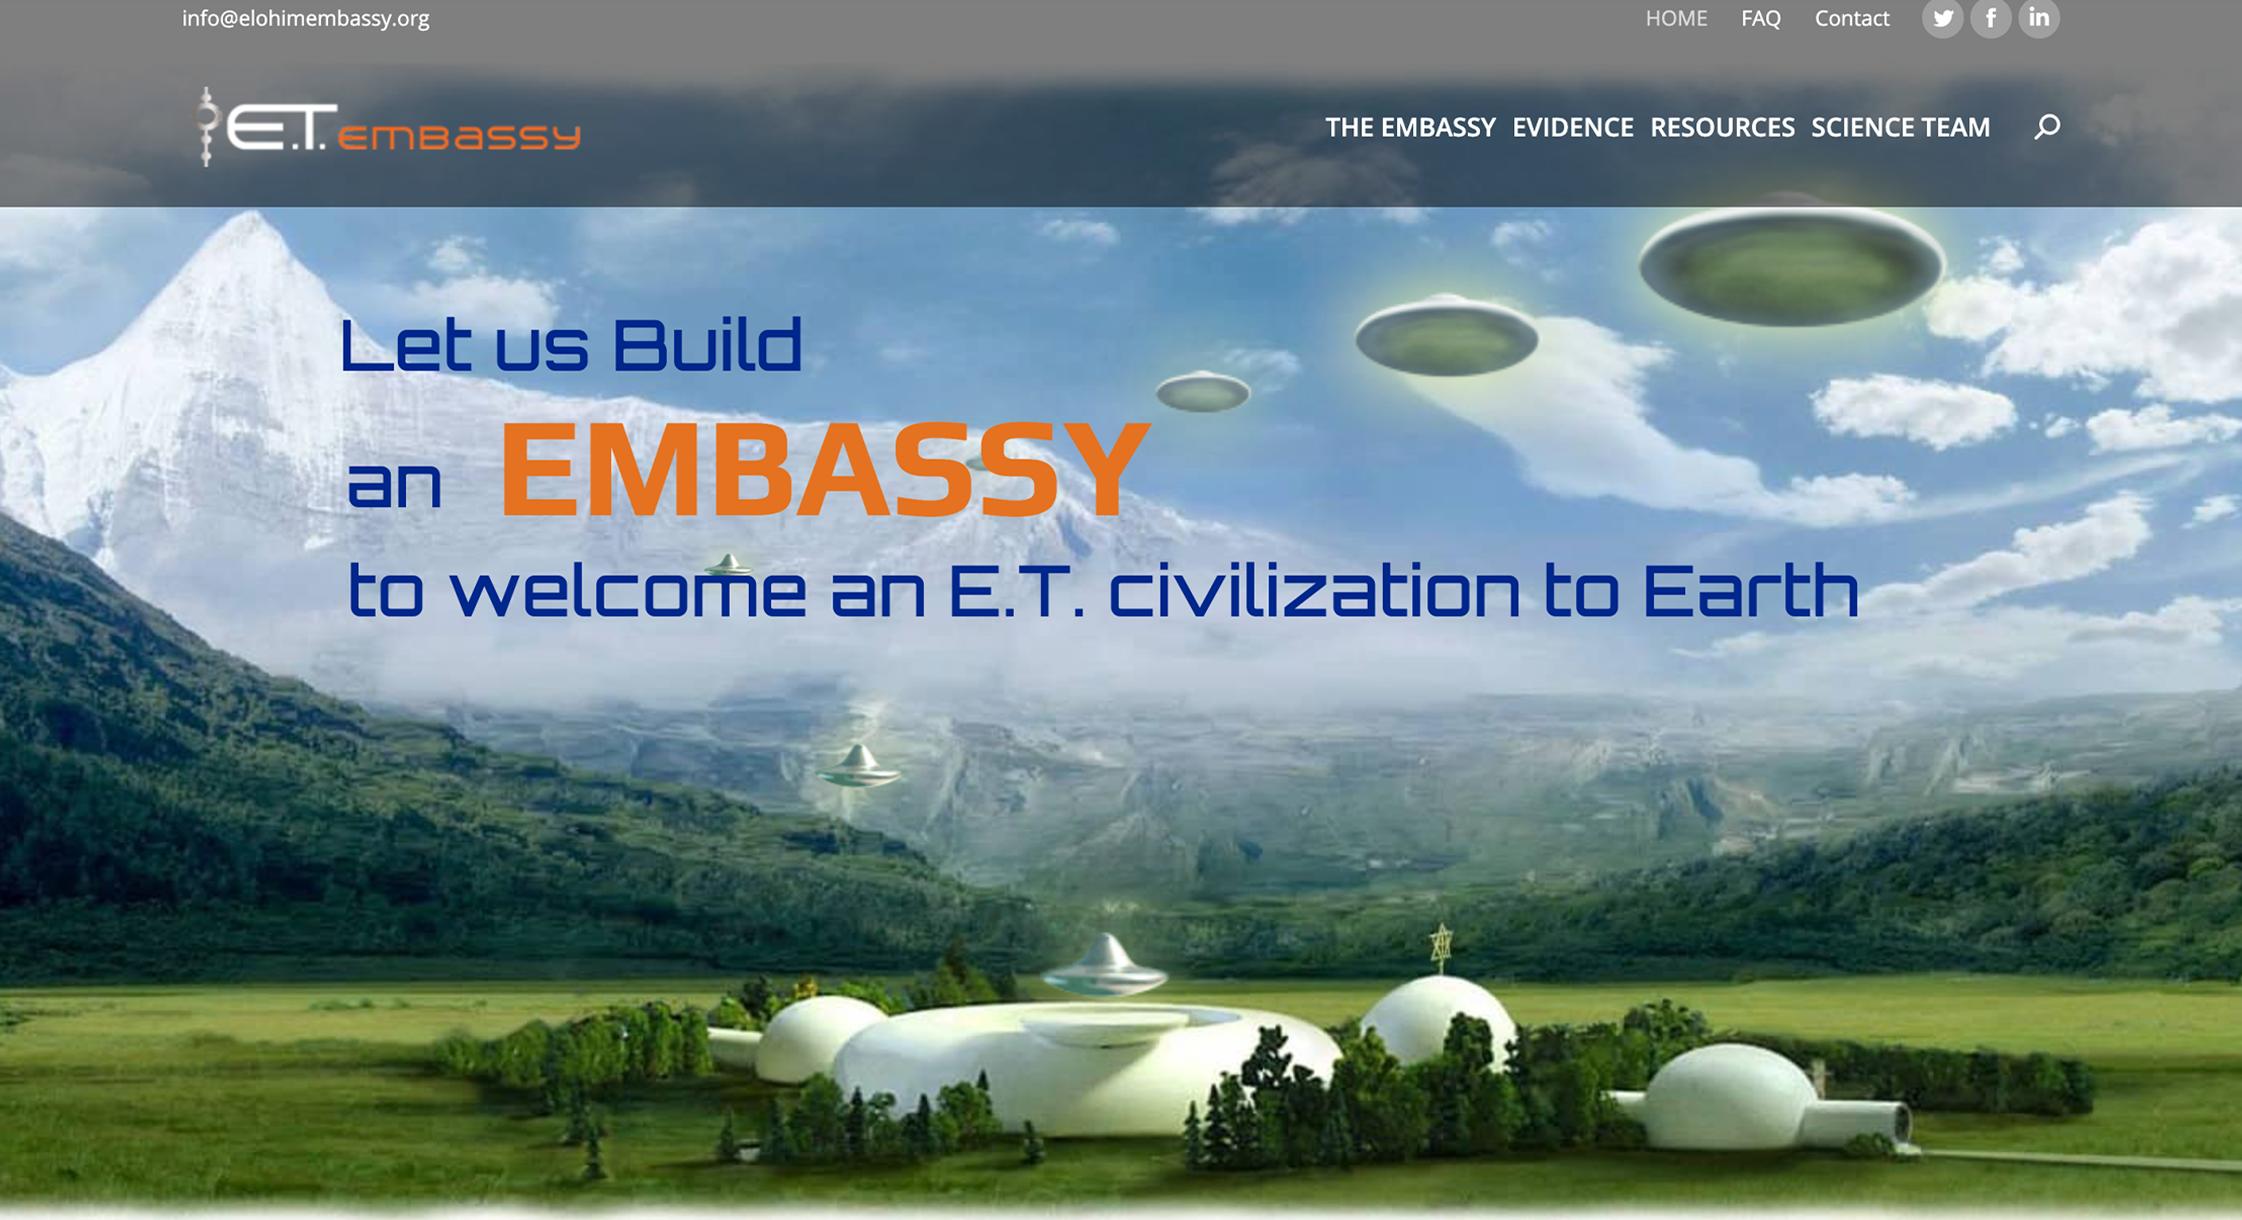 Elohimembassy.org